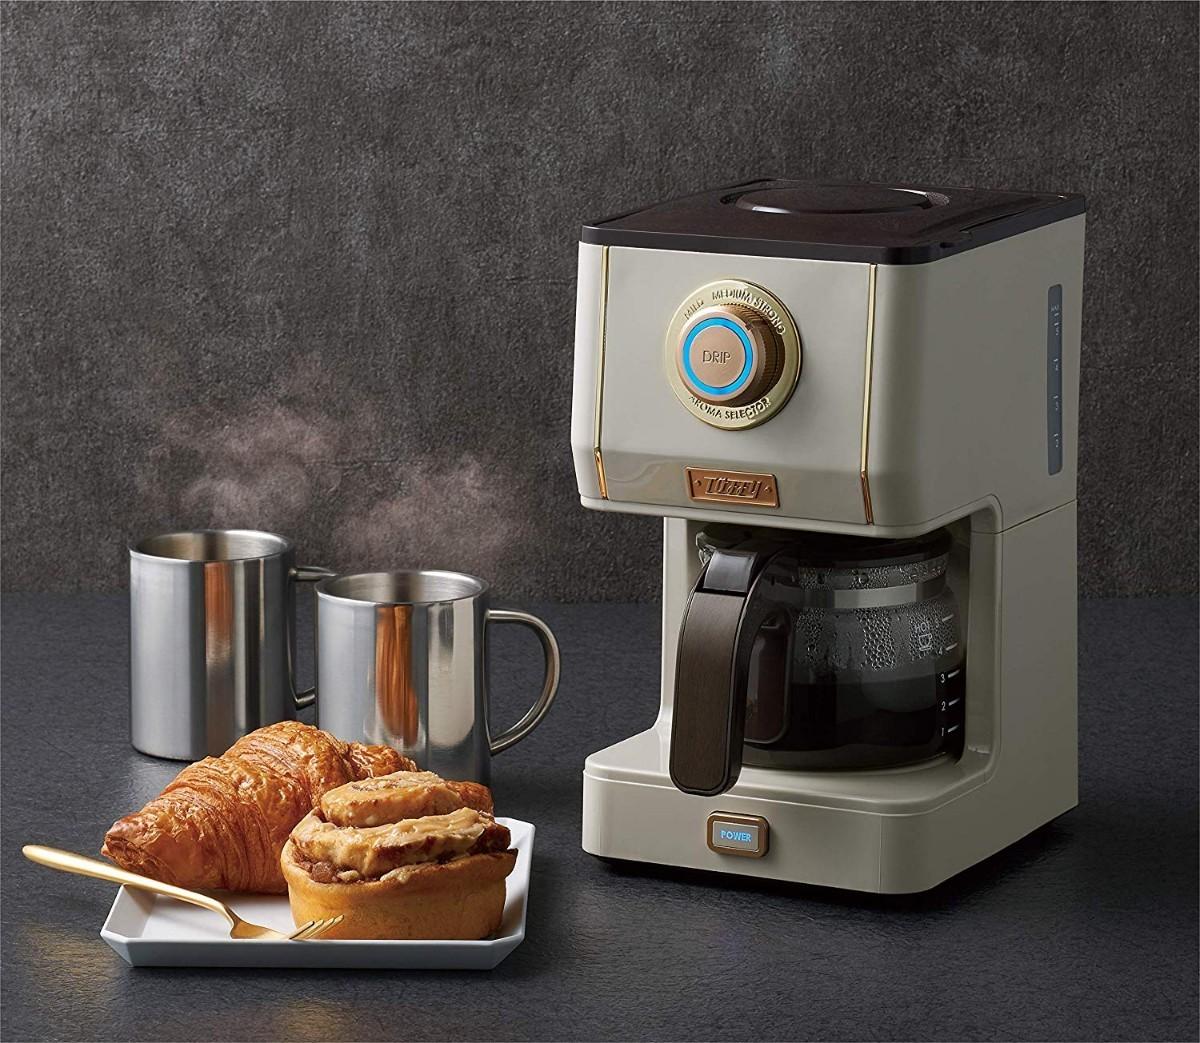 Toffy アロマドリップコーヒーメーカー K-CM5 コーヒーメーカー グレー